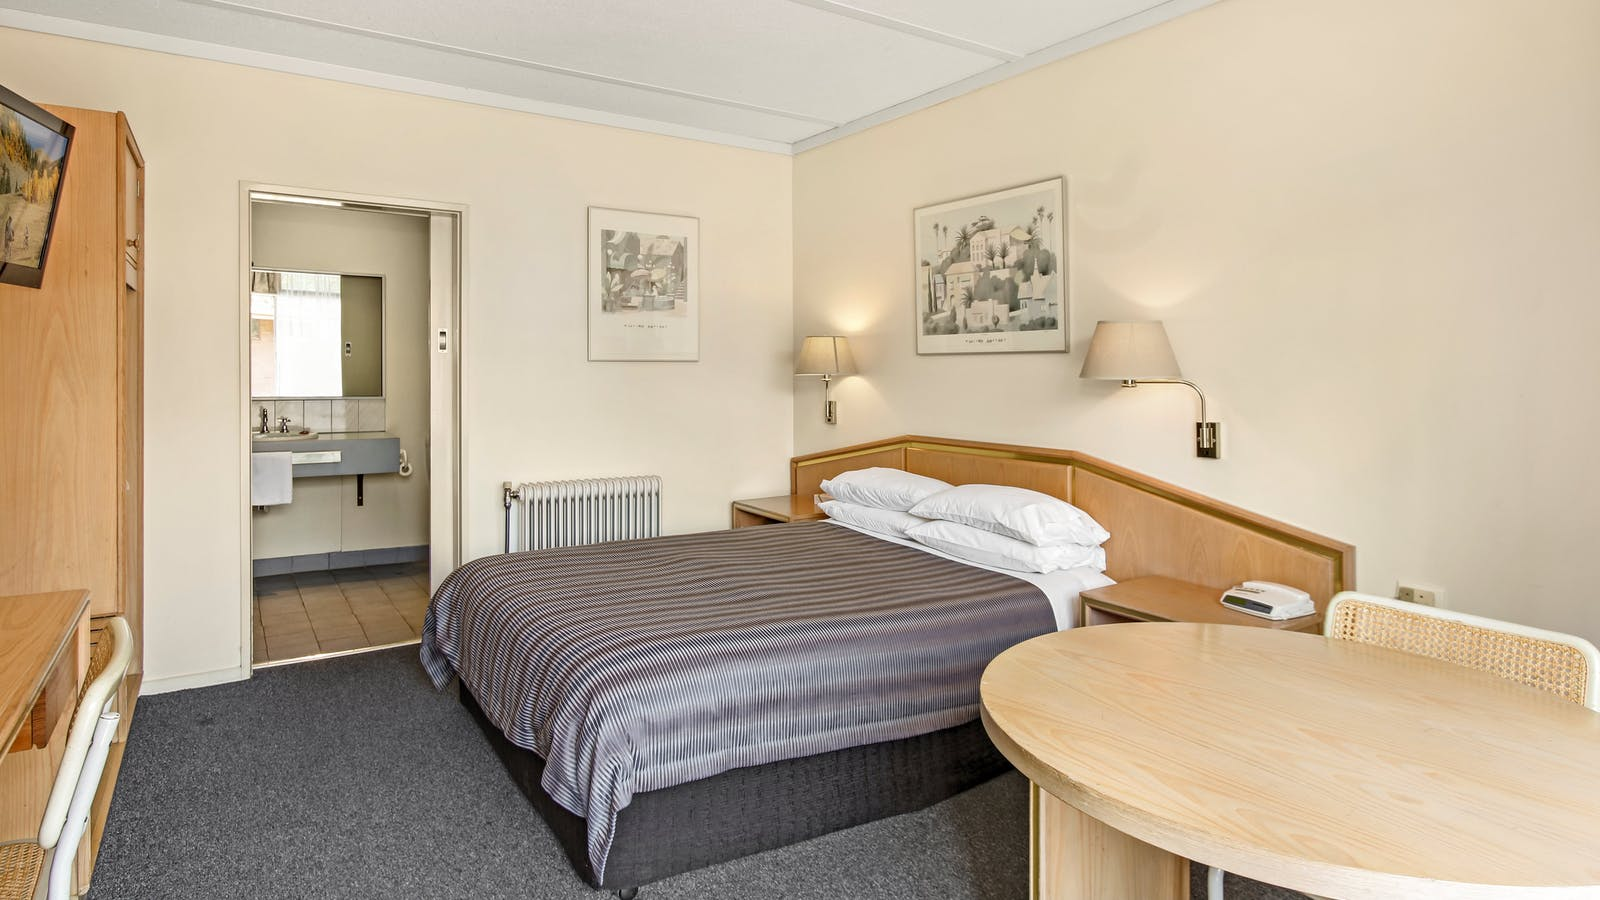 comfort inn moe accommodation gippsland victoria australia. Black Bedroom Furniture Sets. Home Design Ideas